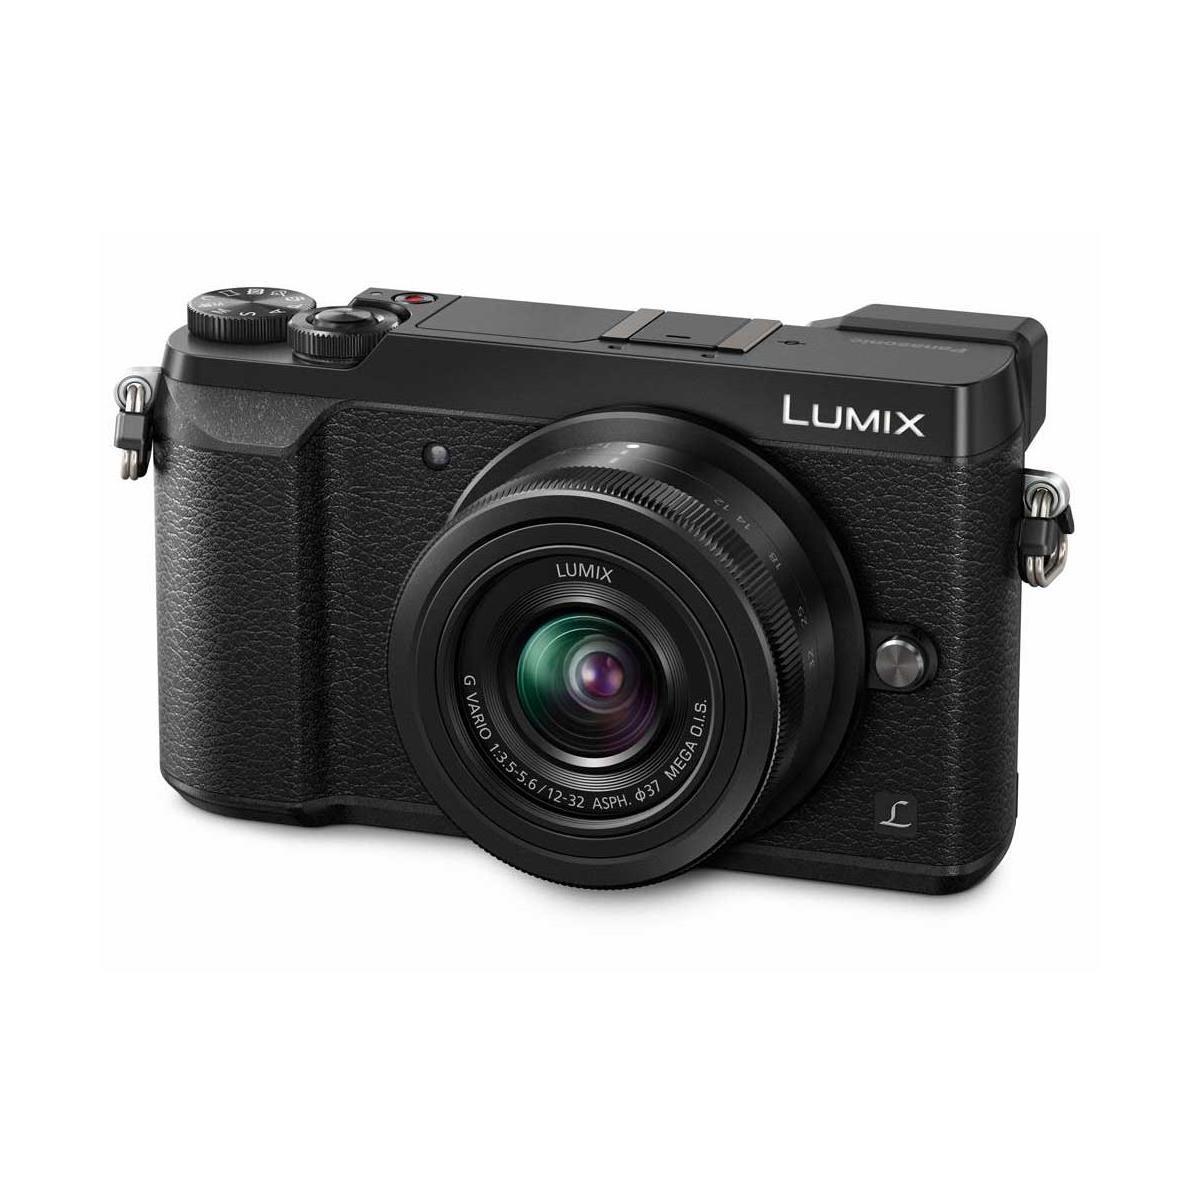 Panasonic Camera Sale: DMC-GX85 + 12-32mm + 45-150 lens $598, DMC-LX100 + $100 Adorama GC $598 & more + free s/h